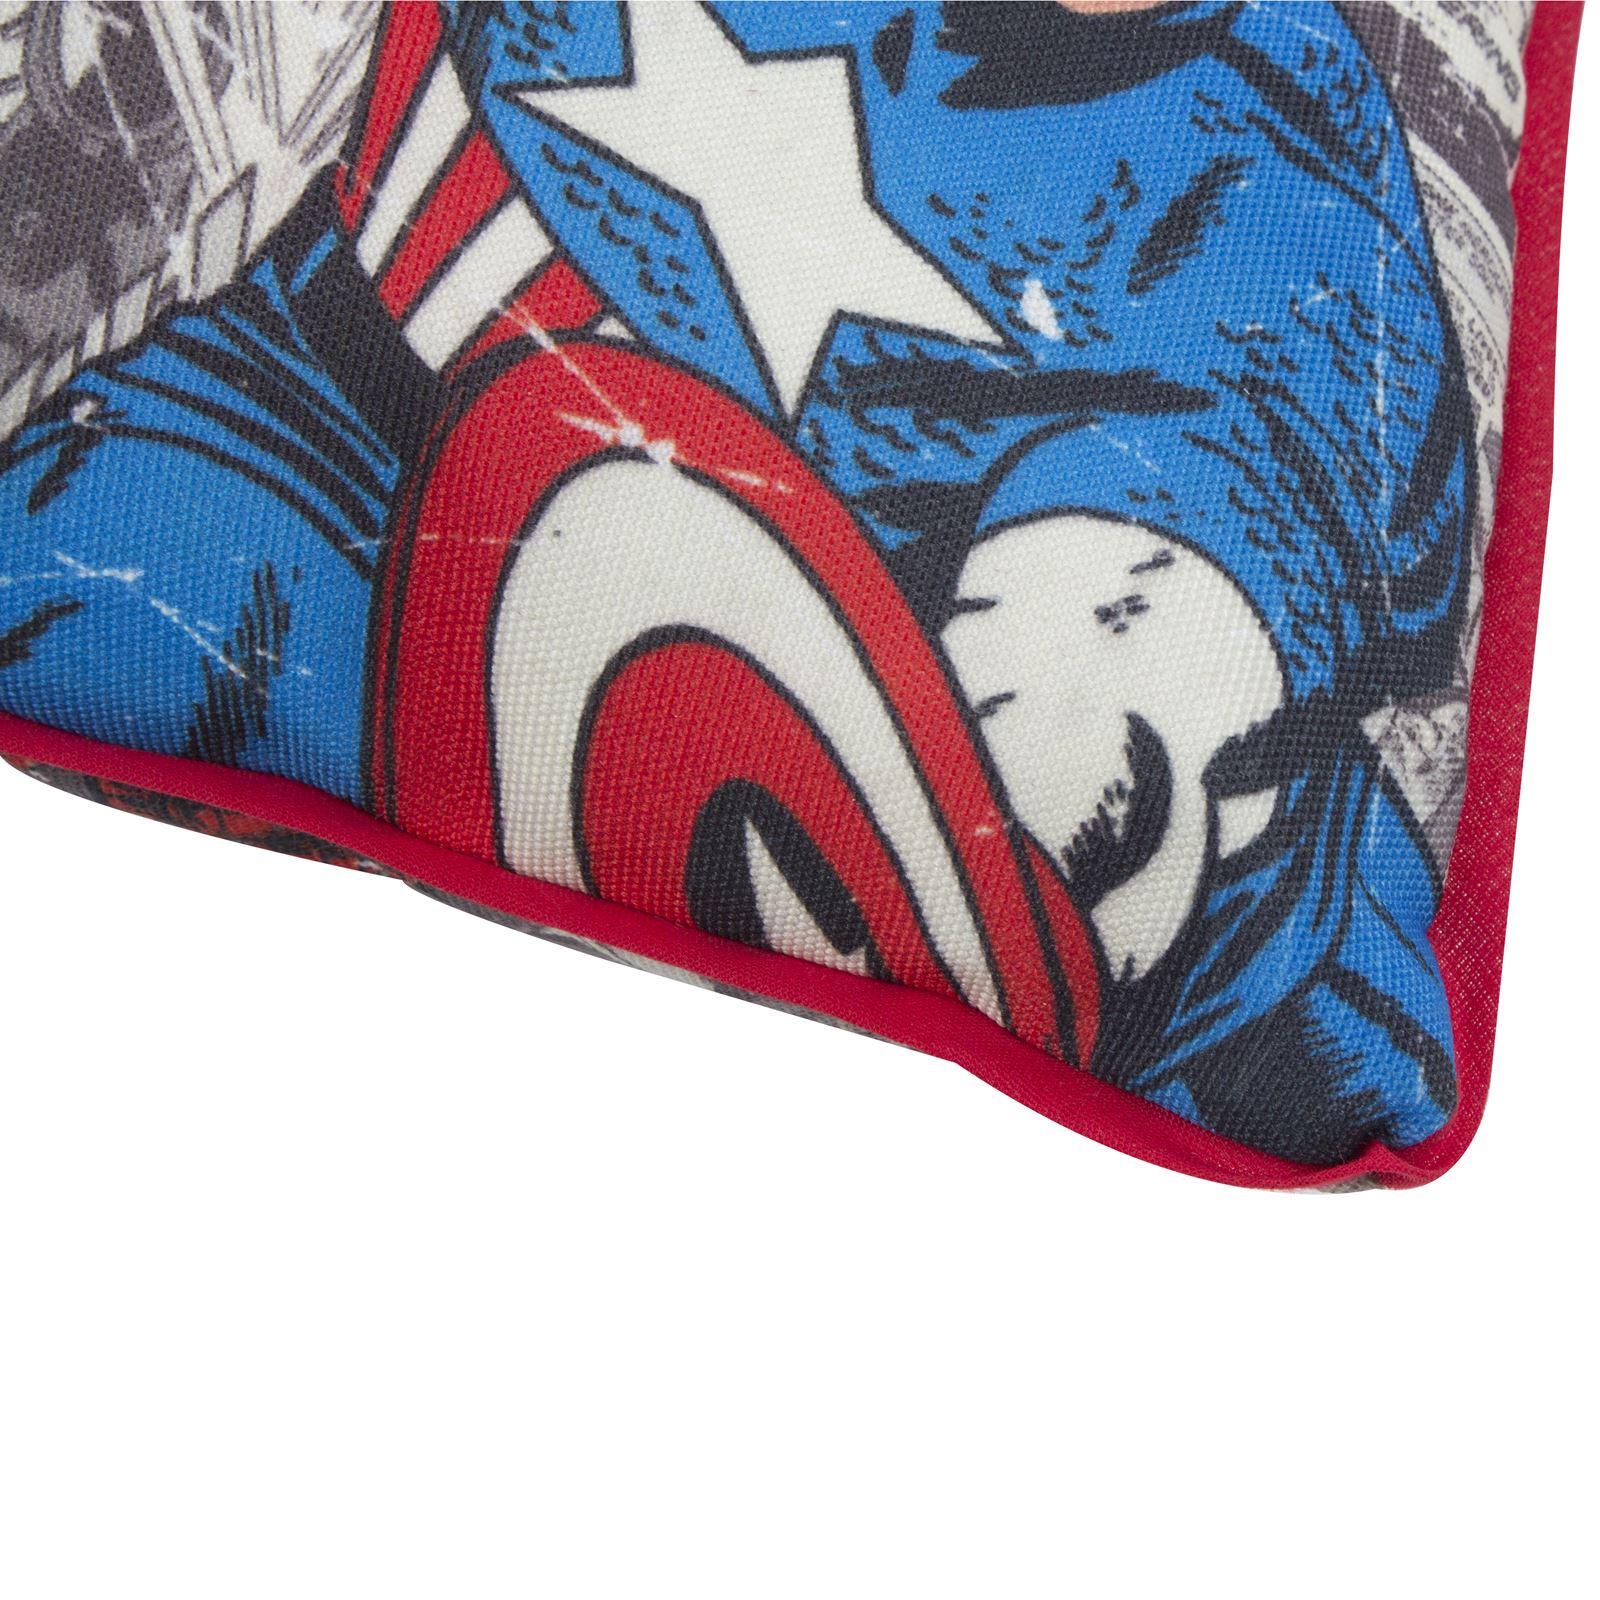 marvel comics gro e leinwand kissen neu iron man hulk thor. Black Bedroom Furniture Sets. Home Design Ideas